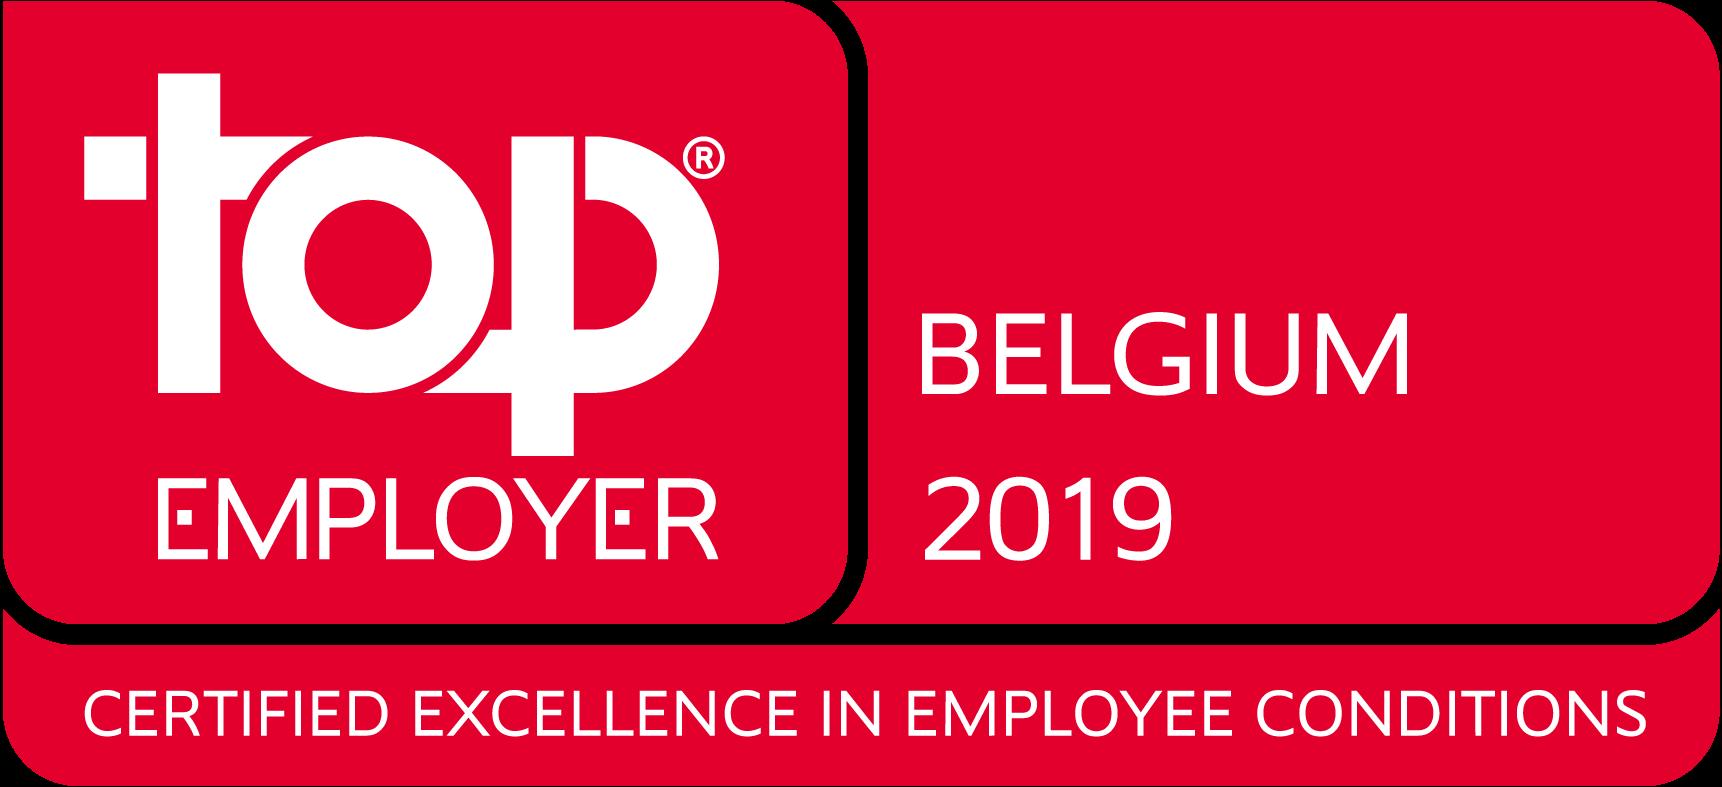 Top_Employer_Belgium_2019_English